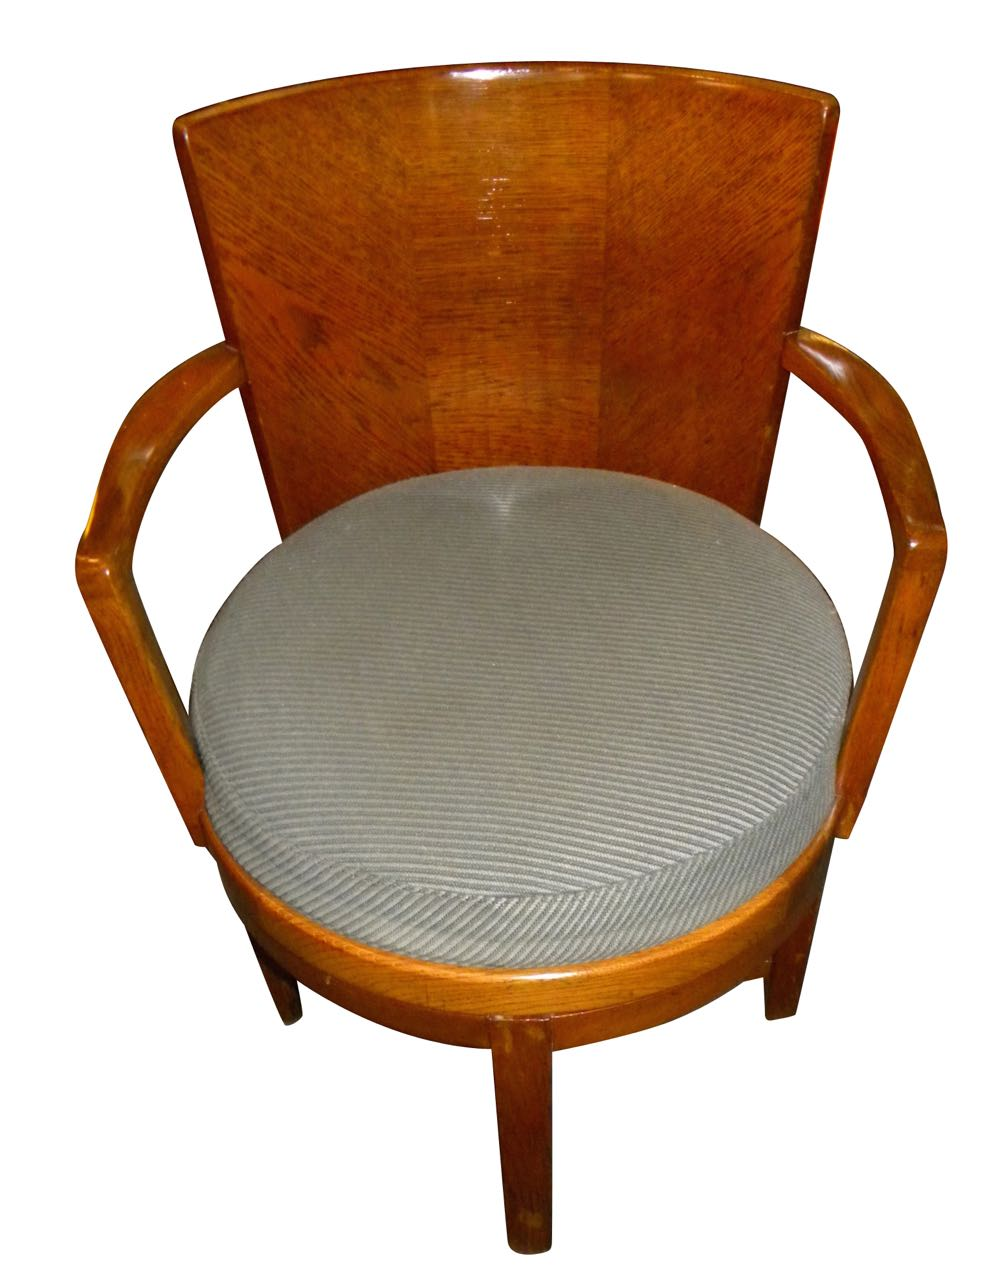 Original art deco swivel oak desk chair